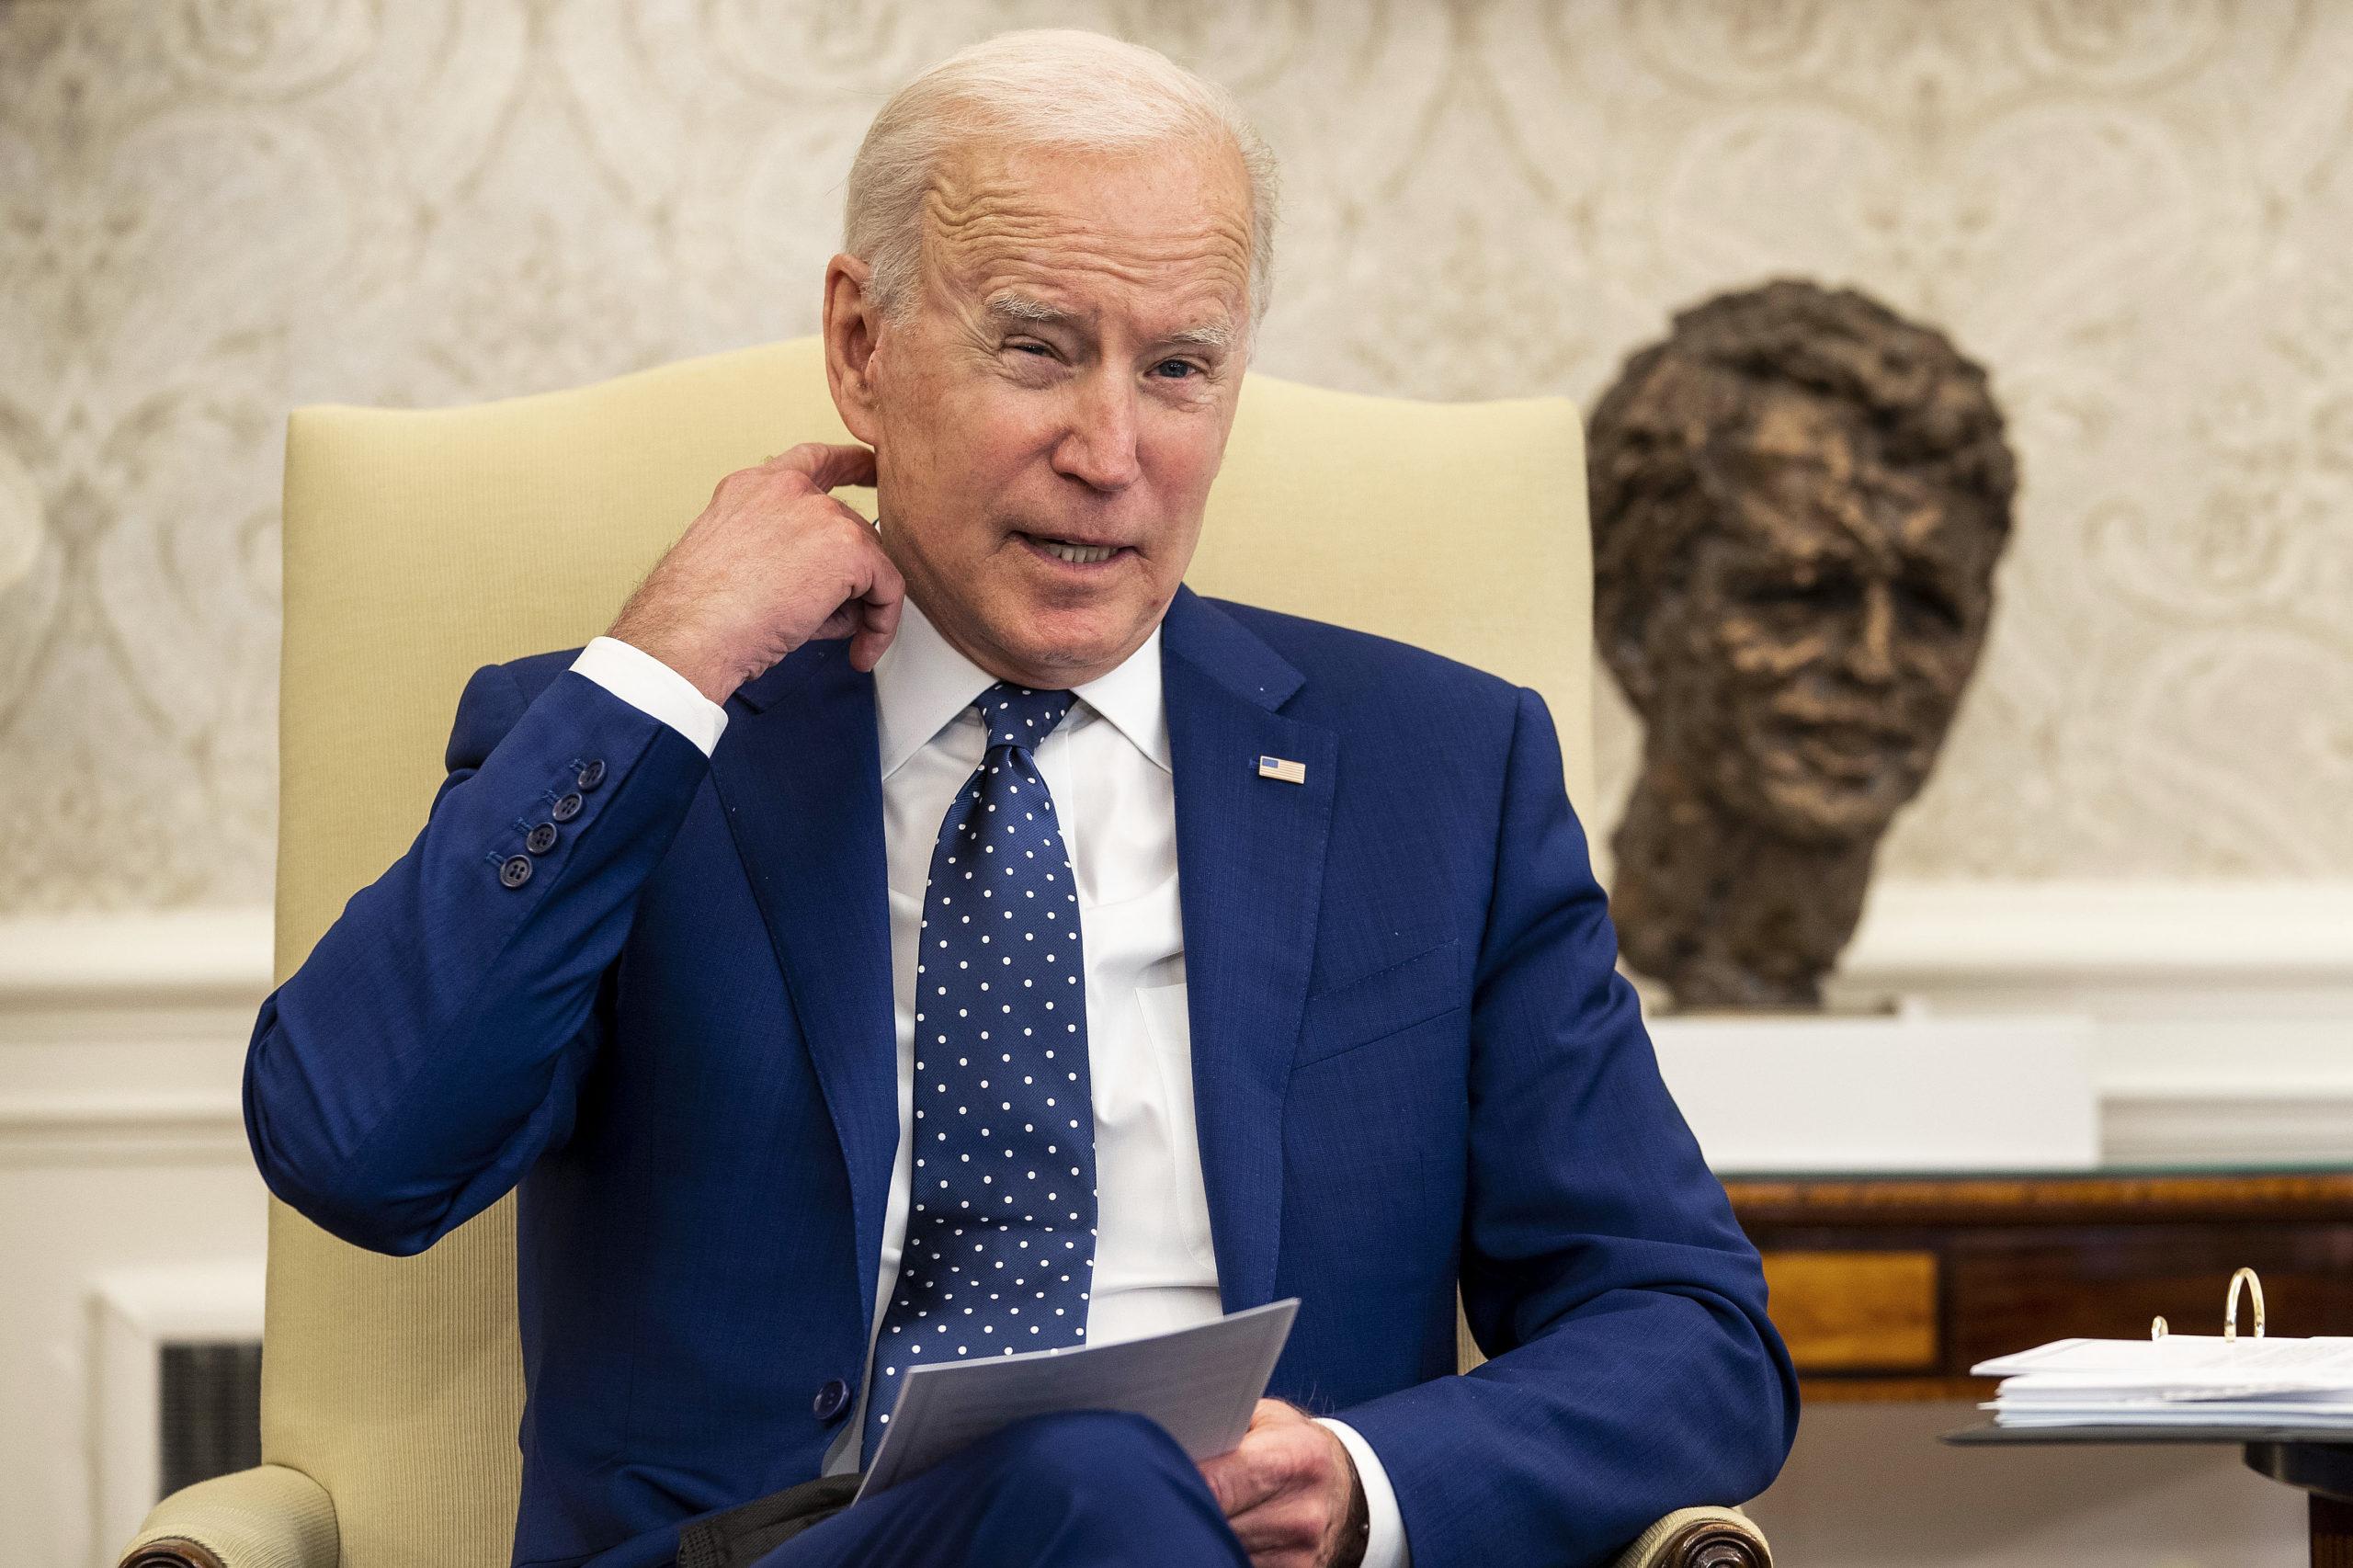 President Joe Biden meets with members of Congress. (Doug Mills/Pool/Getty Images)